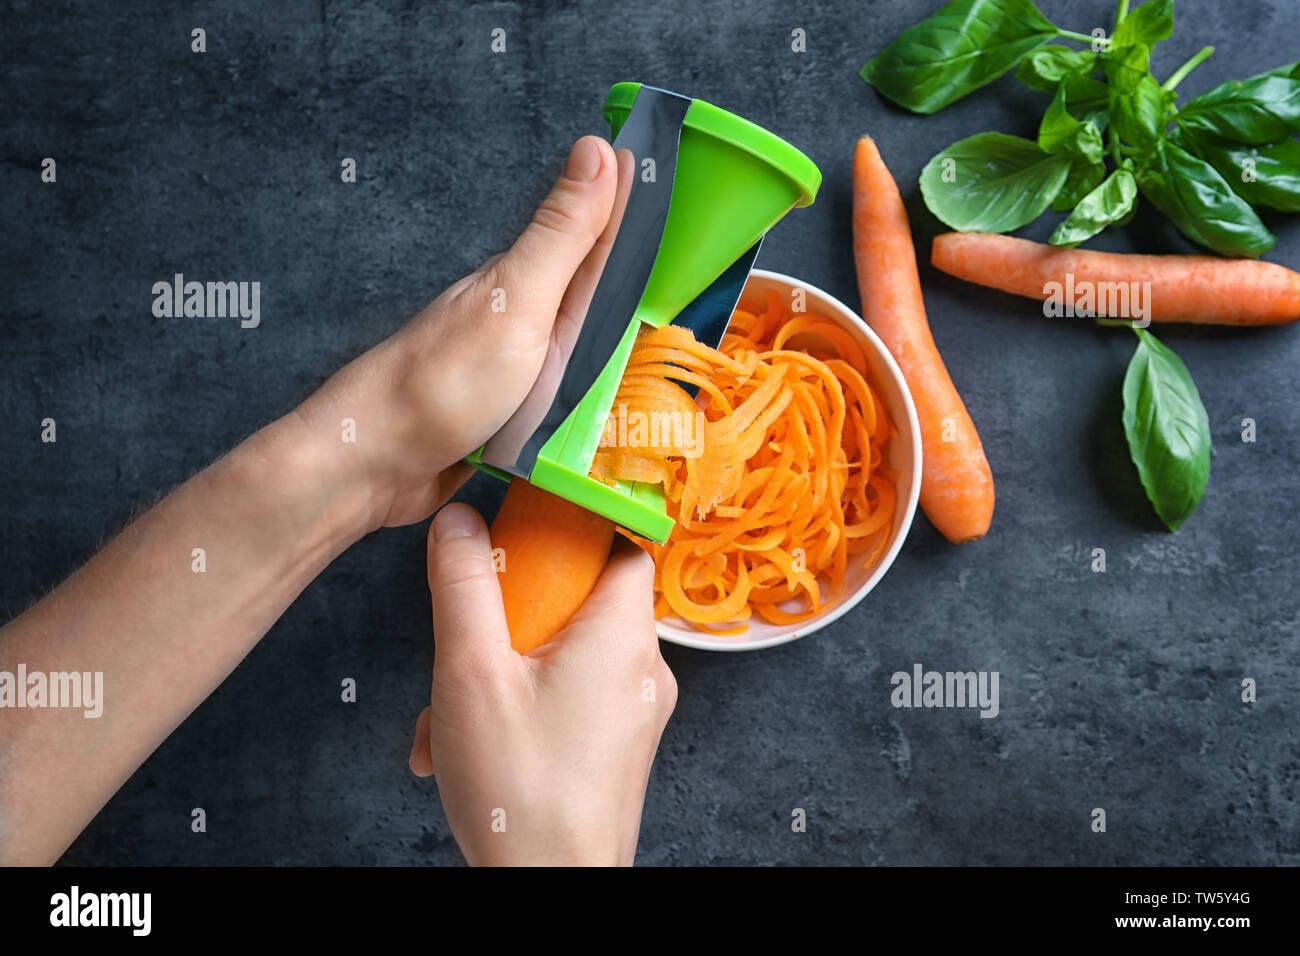 Woman using vegetable spiral slicer to make carrot spaghetti Stock Photo